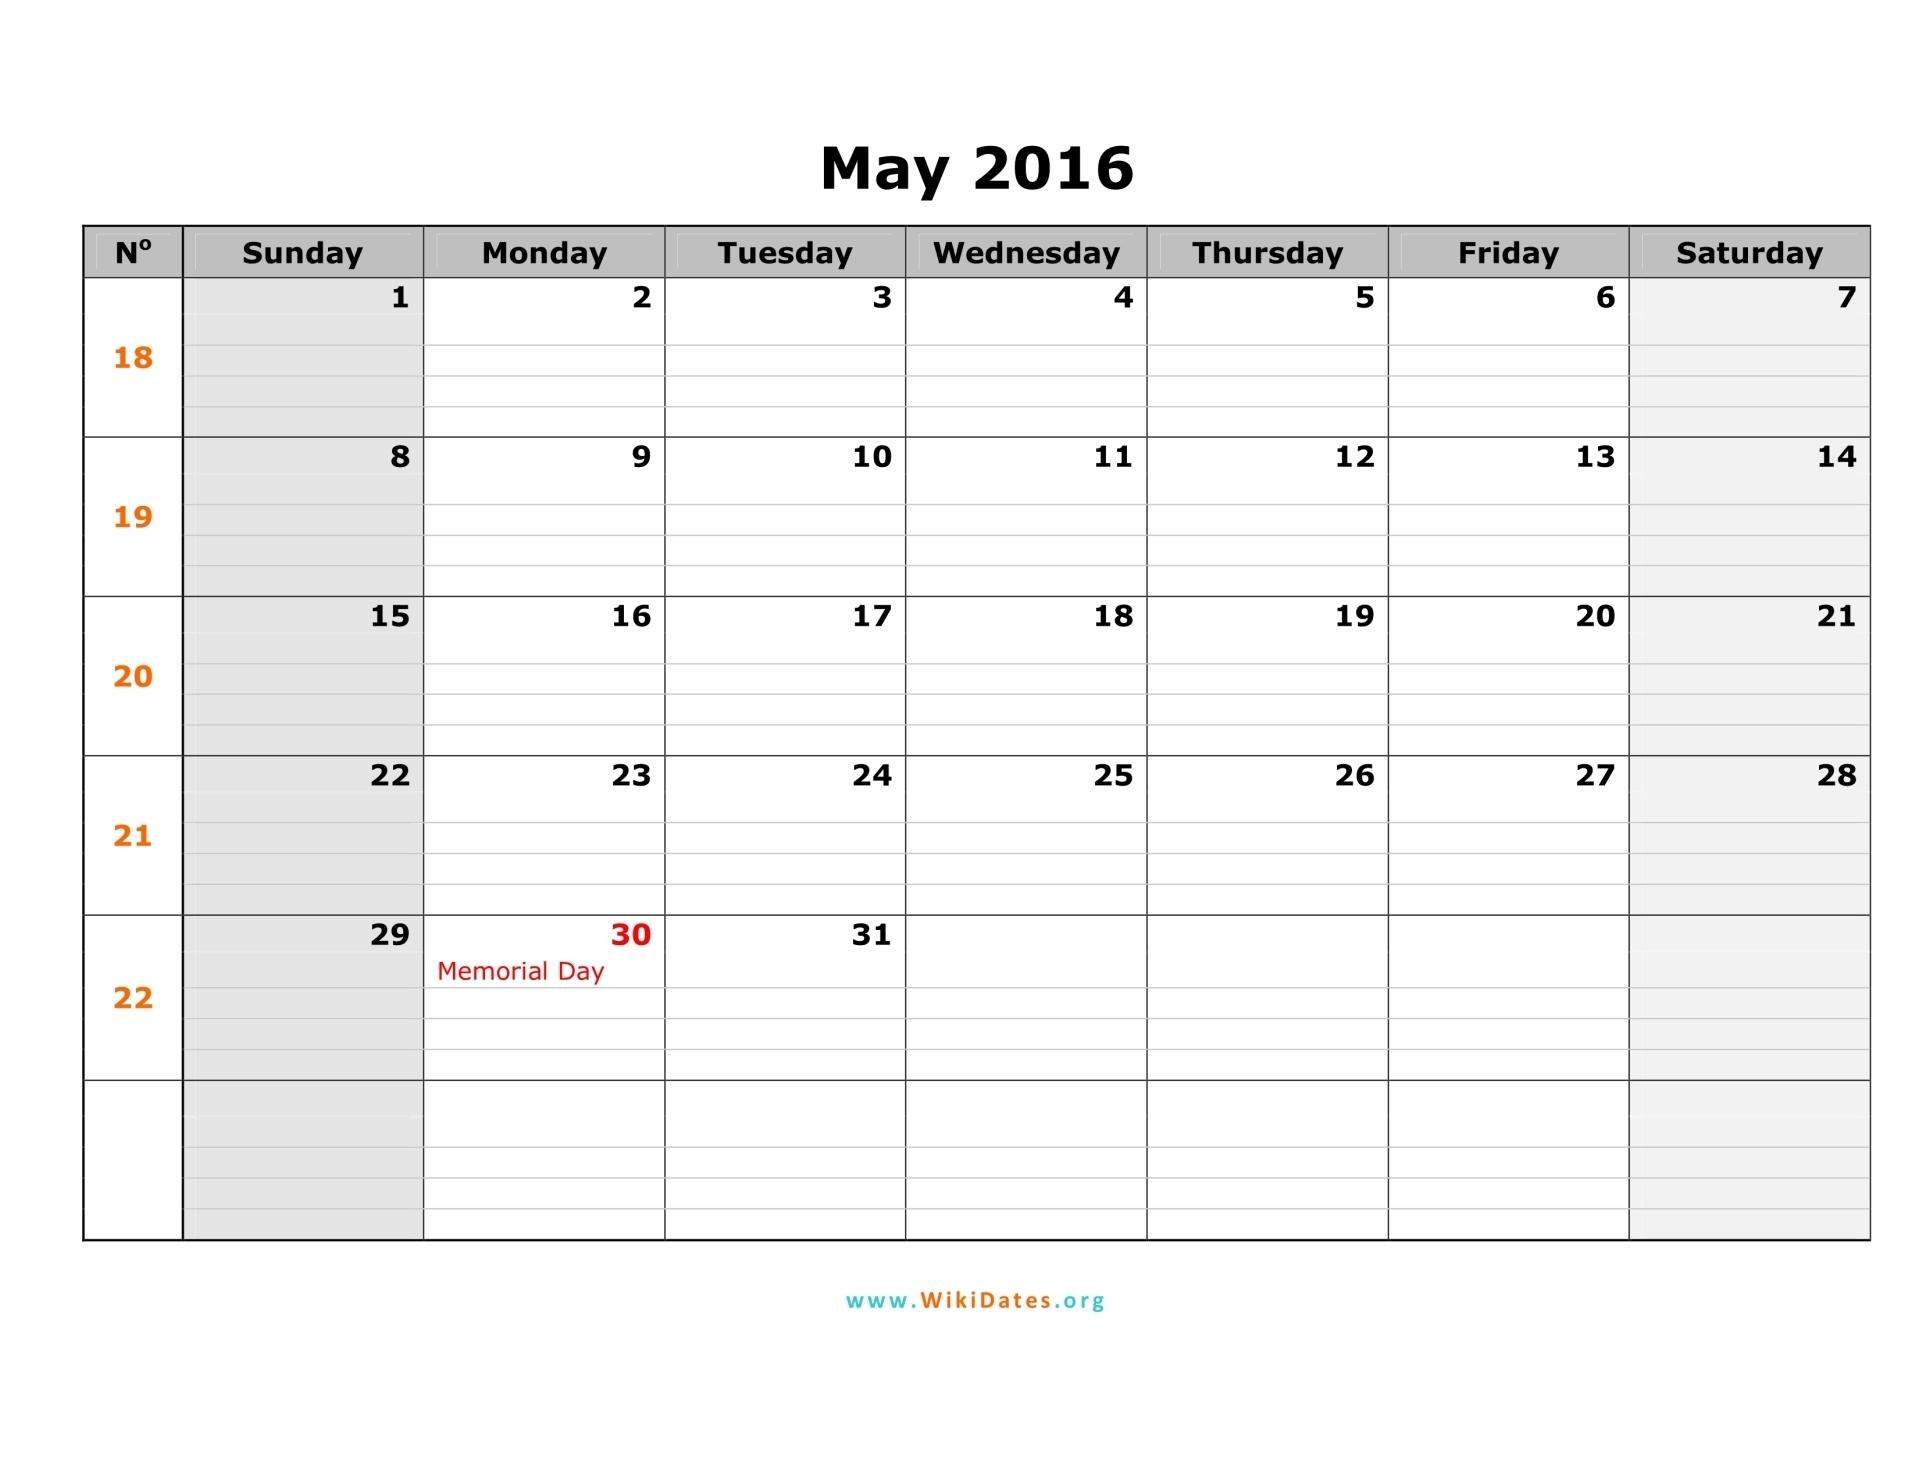 May 2016 Calendar | WikiDates.org